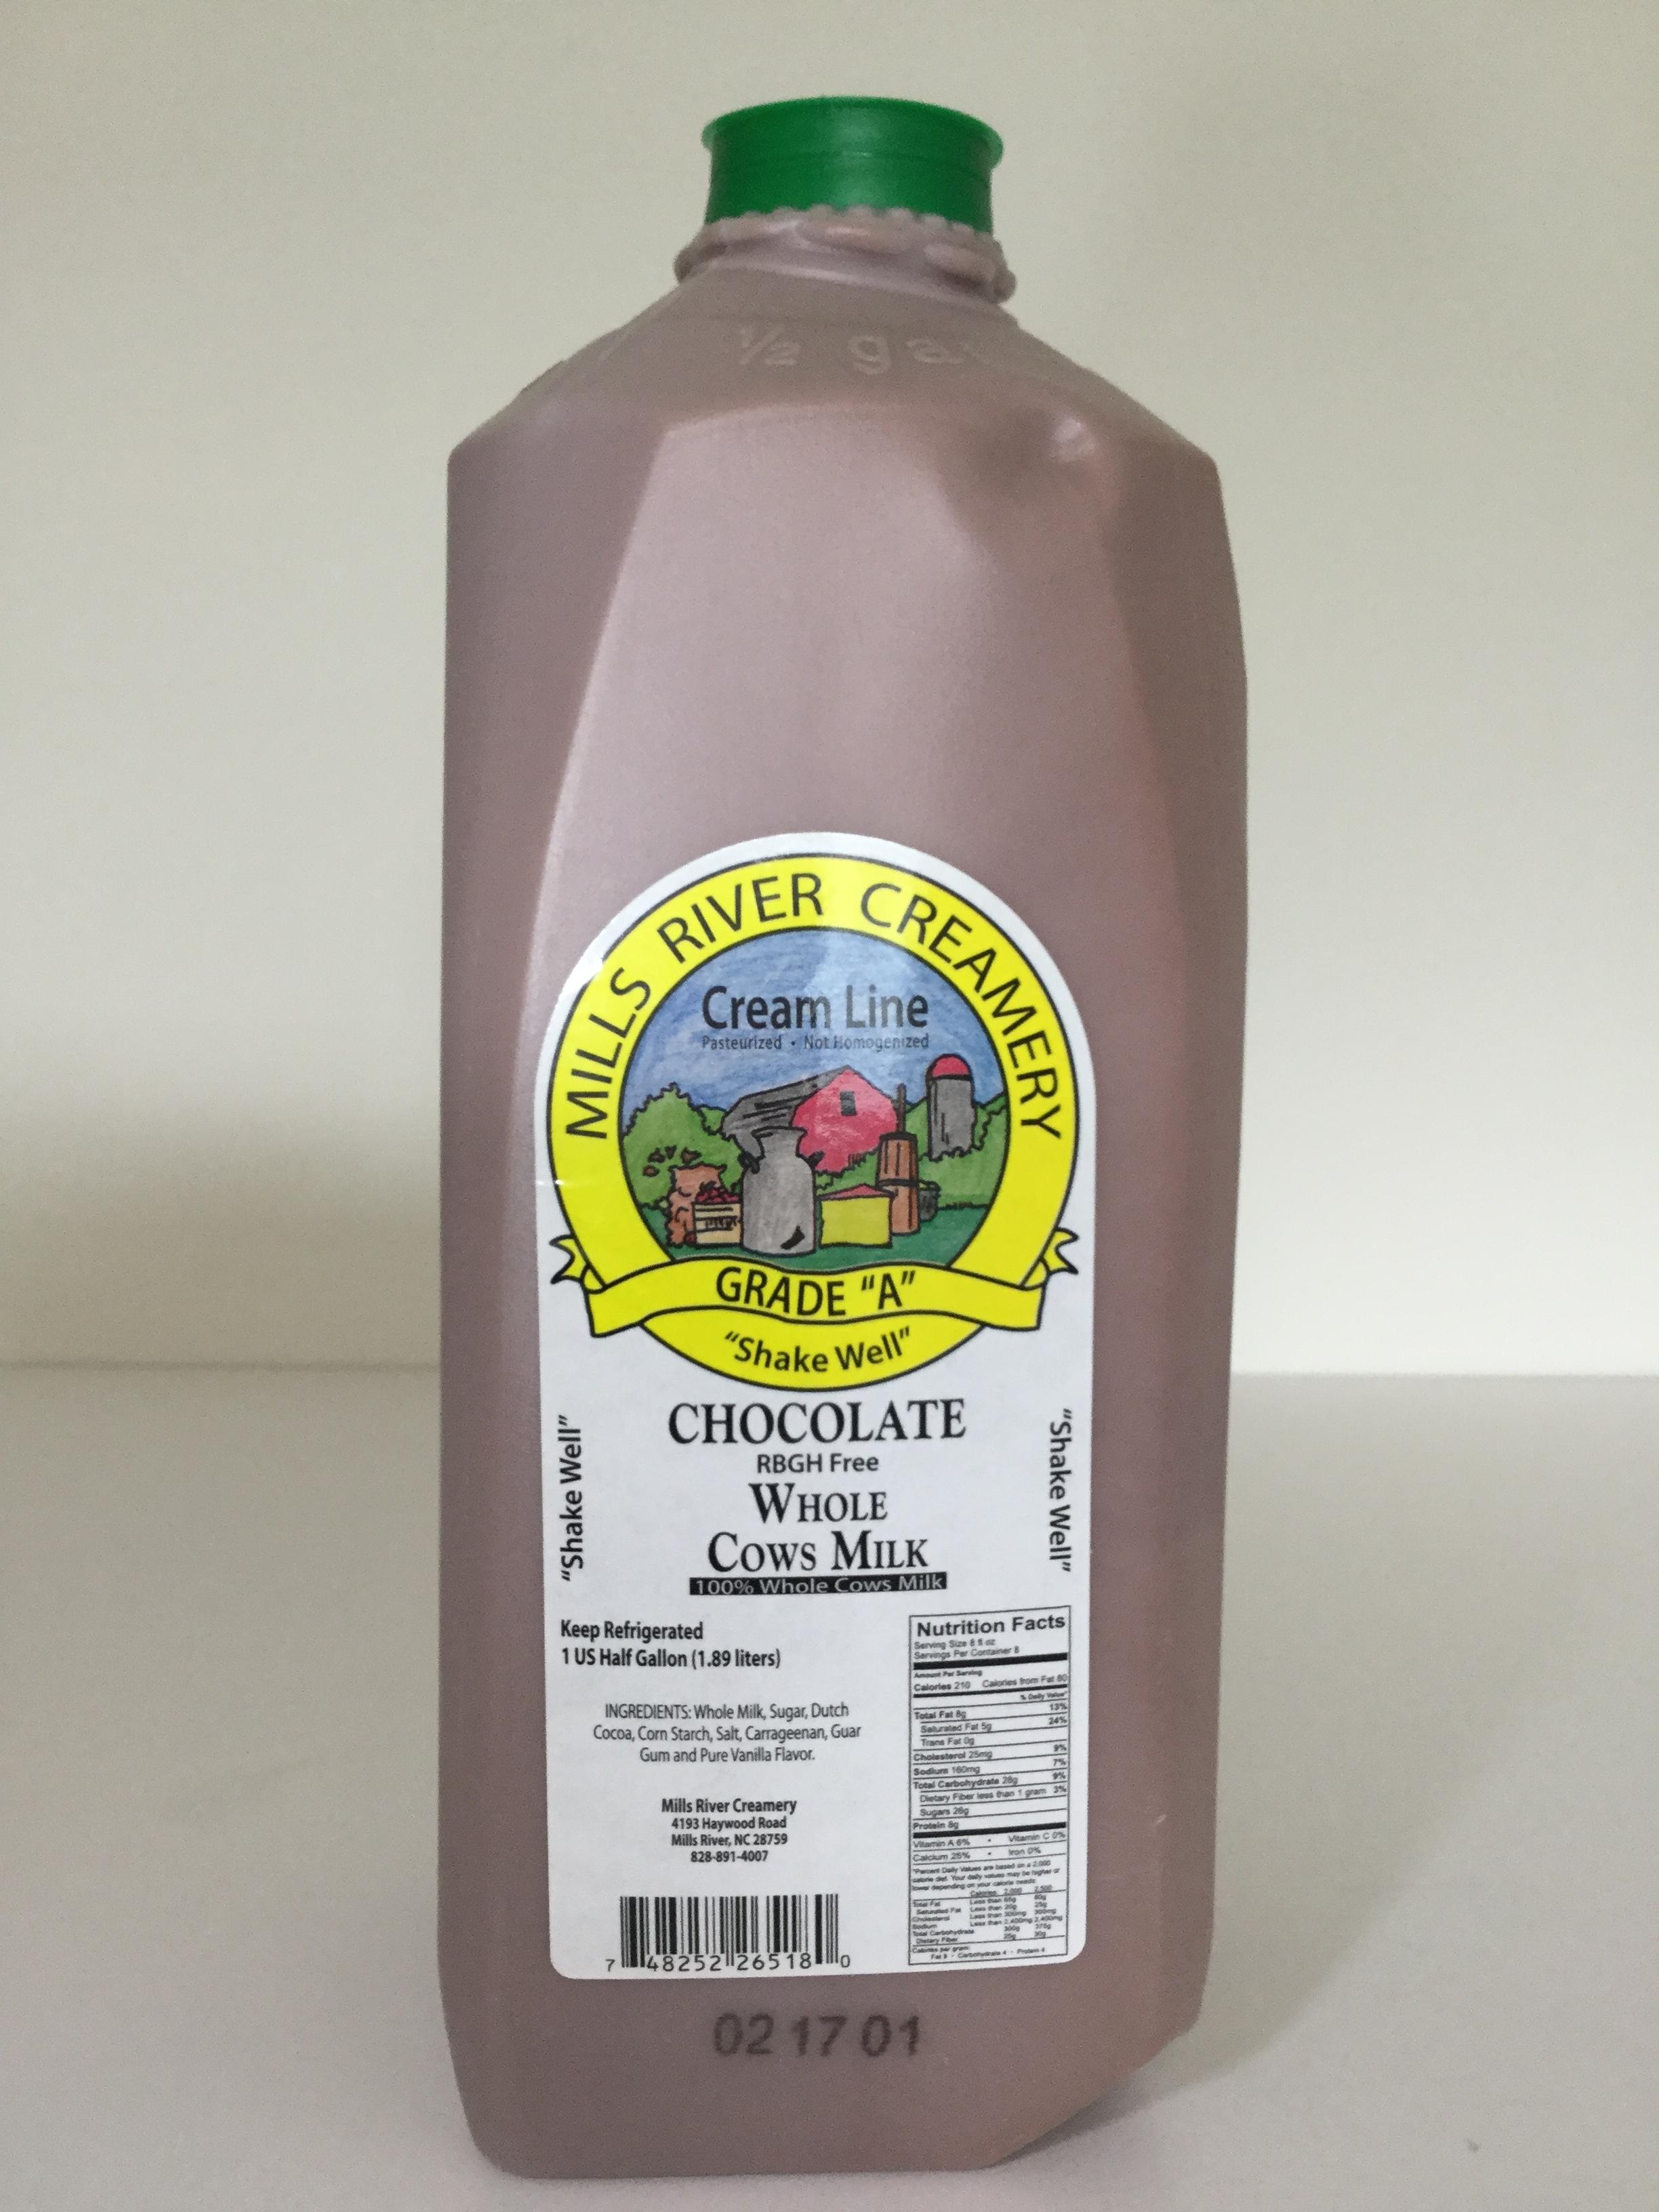 Mills River Creamery Chocolate Milk Side 3